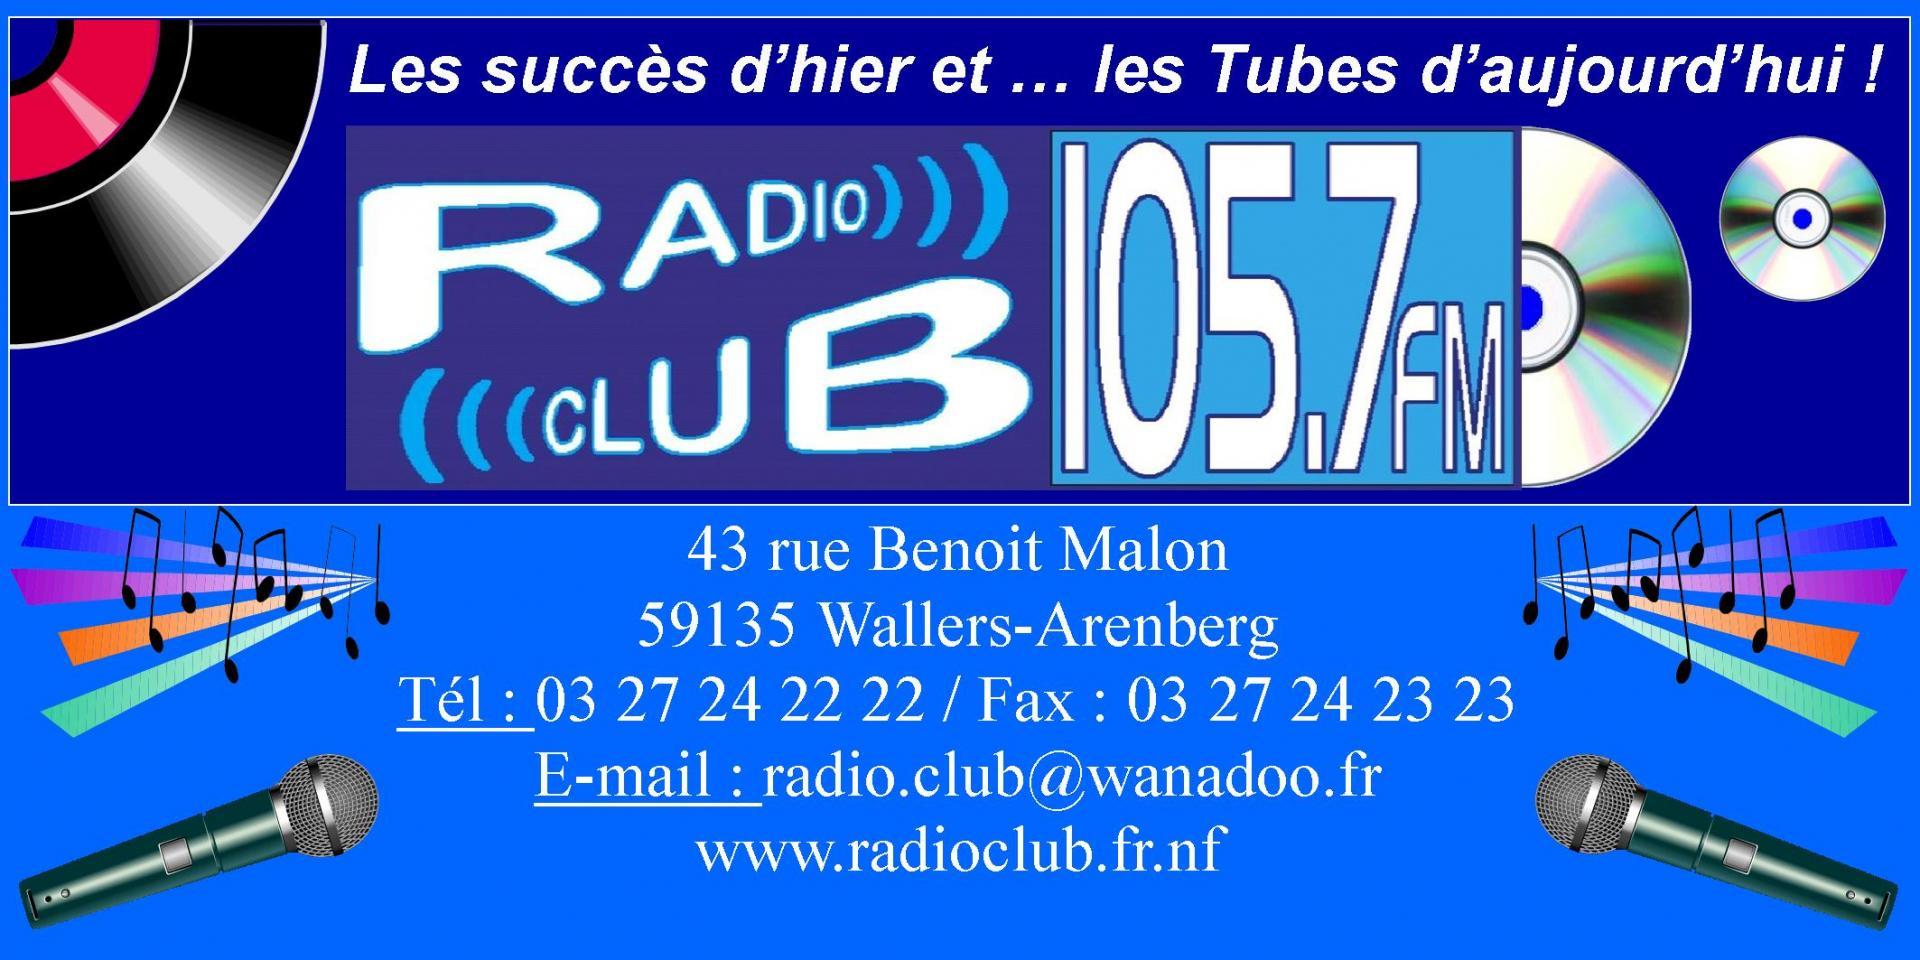 Caliquot radioclub